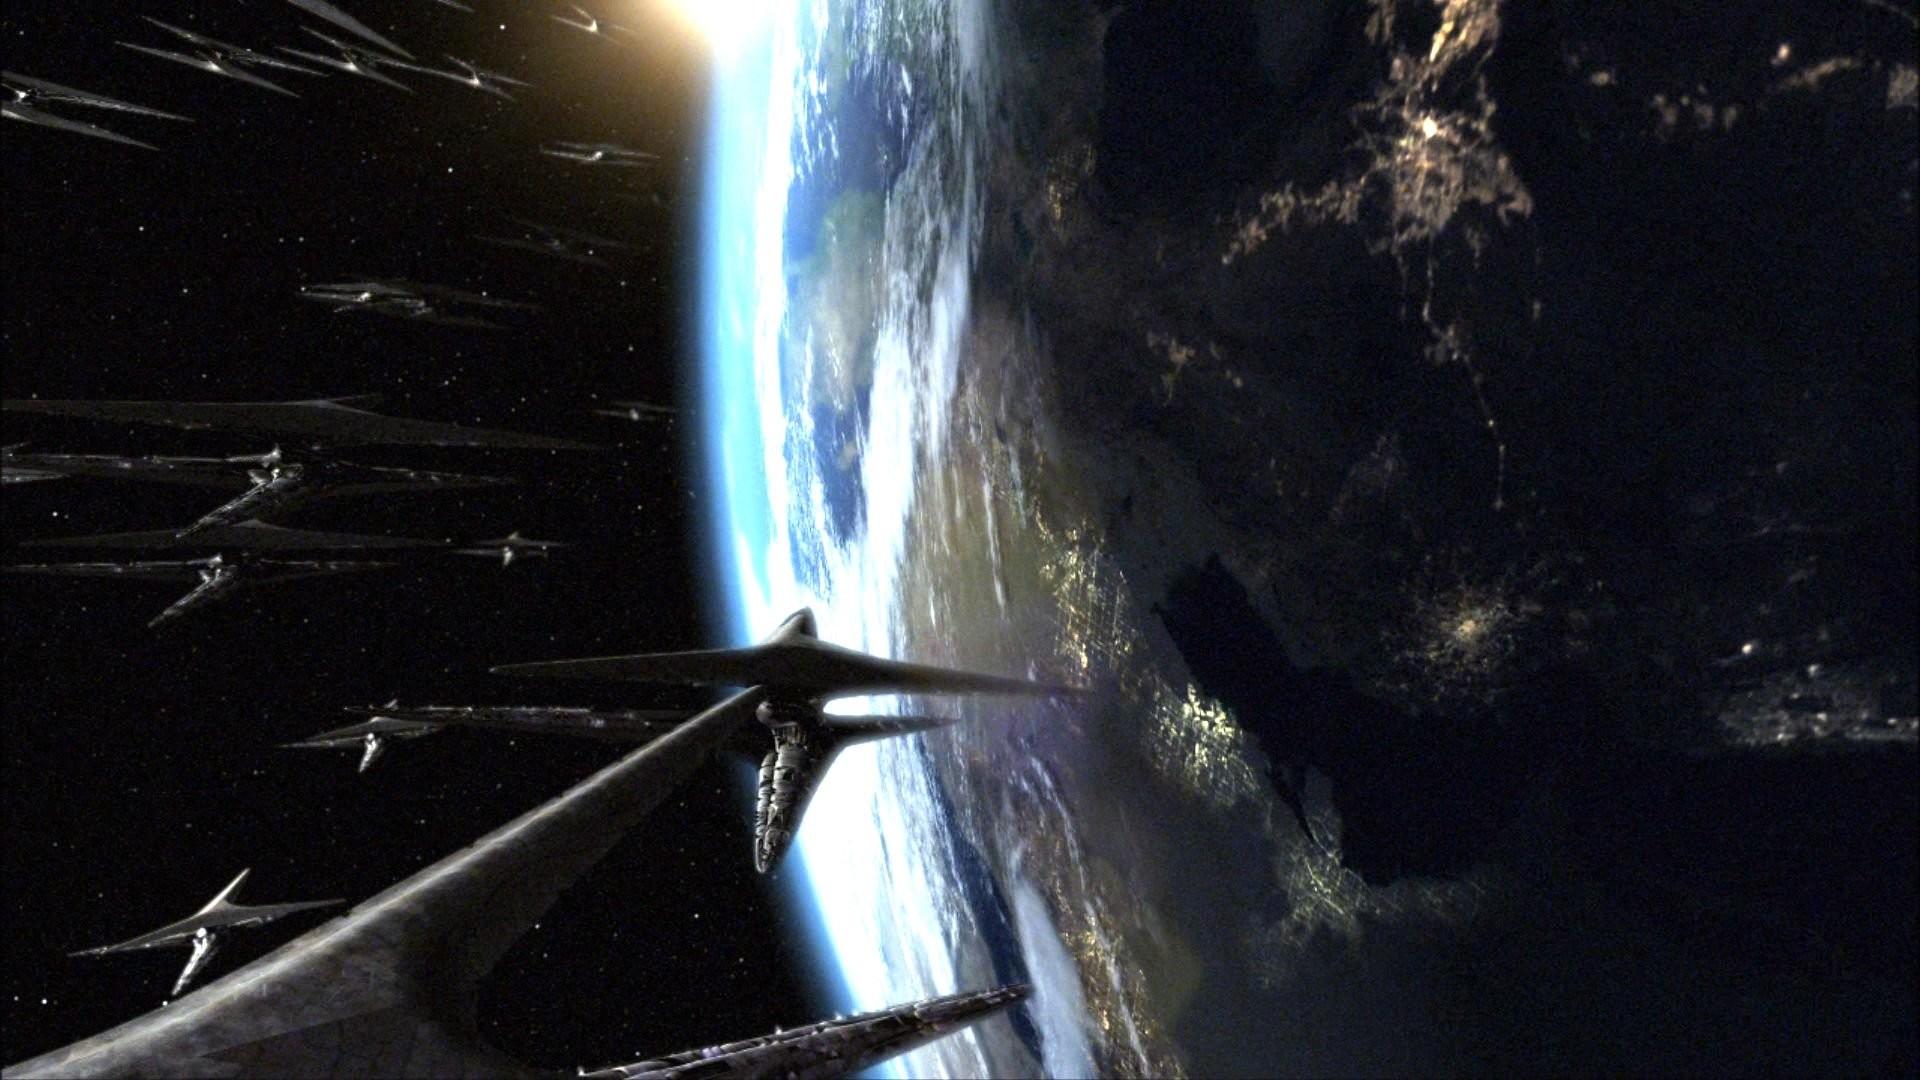 BATTLESTAR GALACTICA action adventure drama sci-fi spaceship wallpaper      264929   WallpaperUP